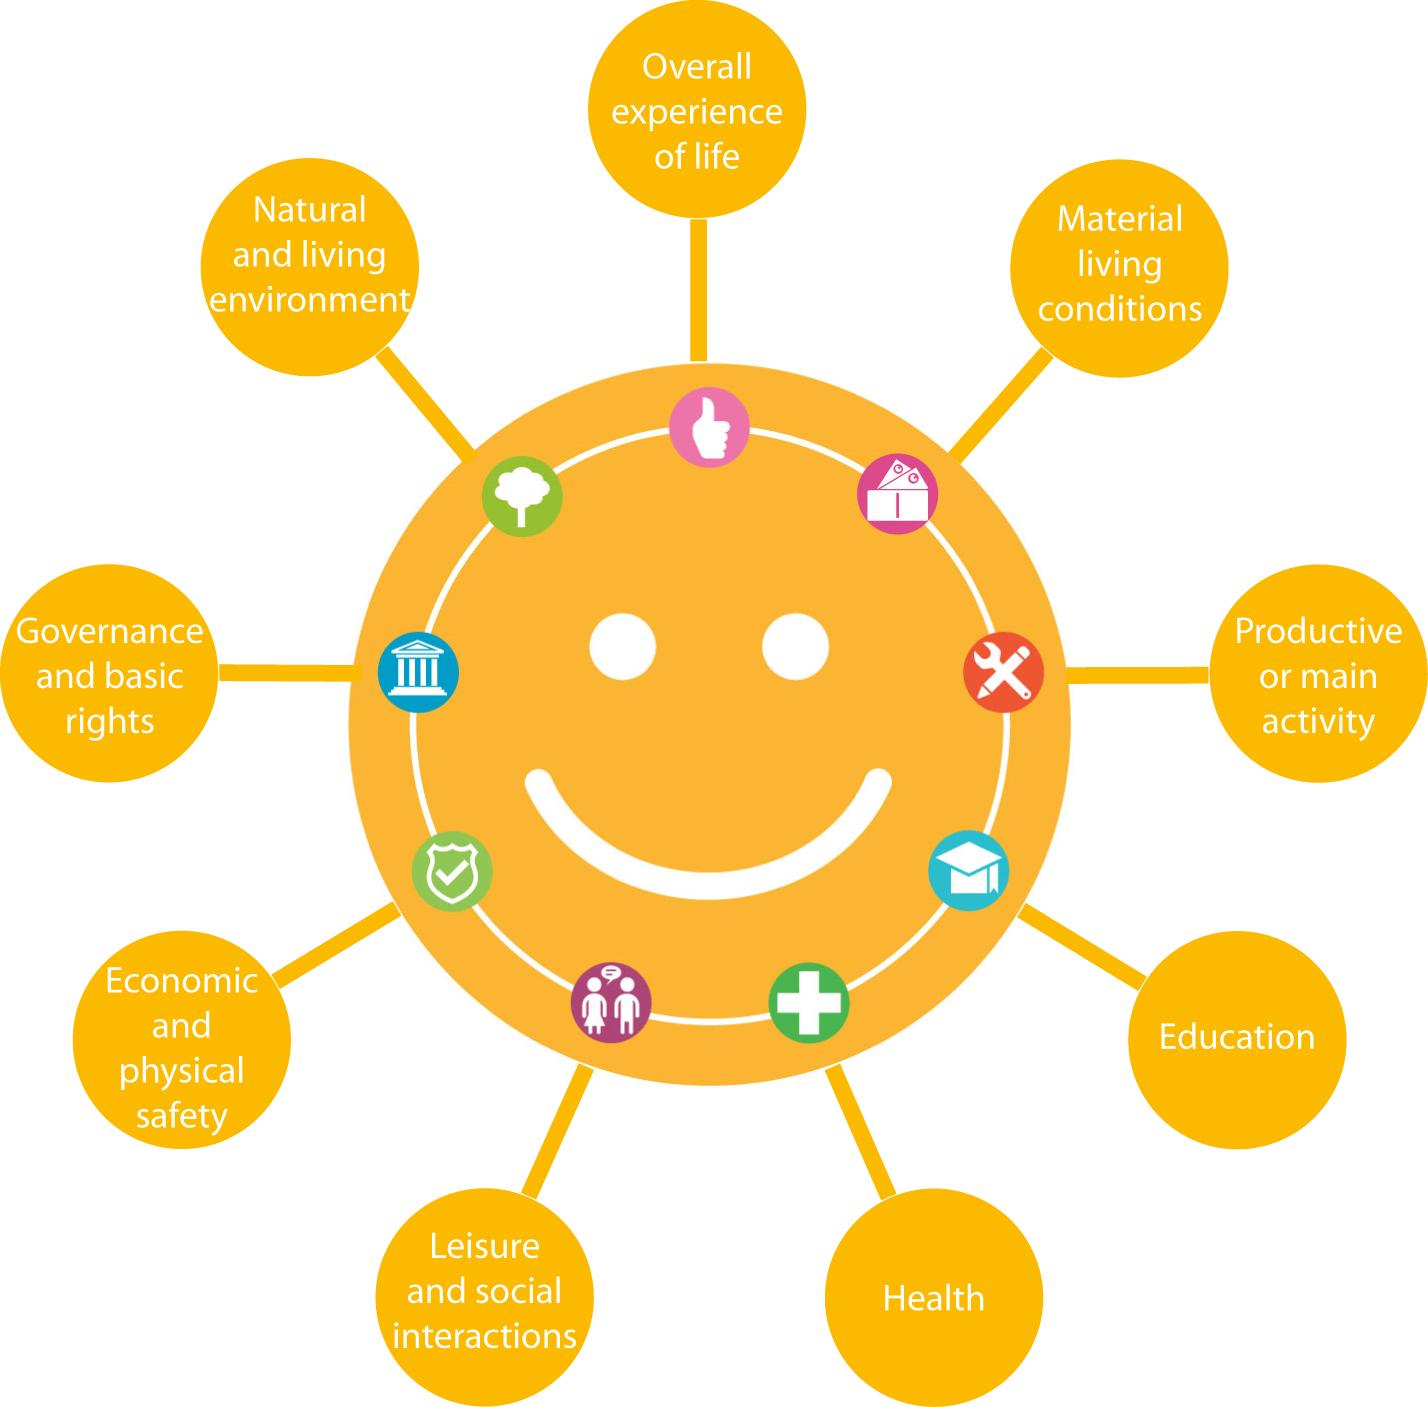 Quality of Life (QoL) indicators organisation